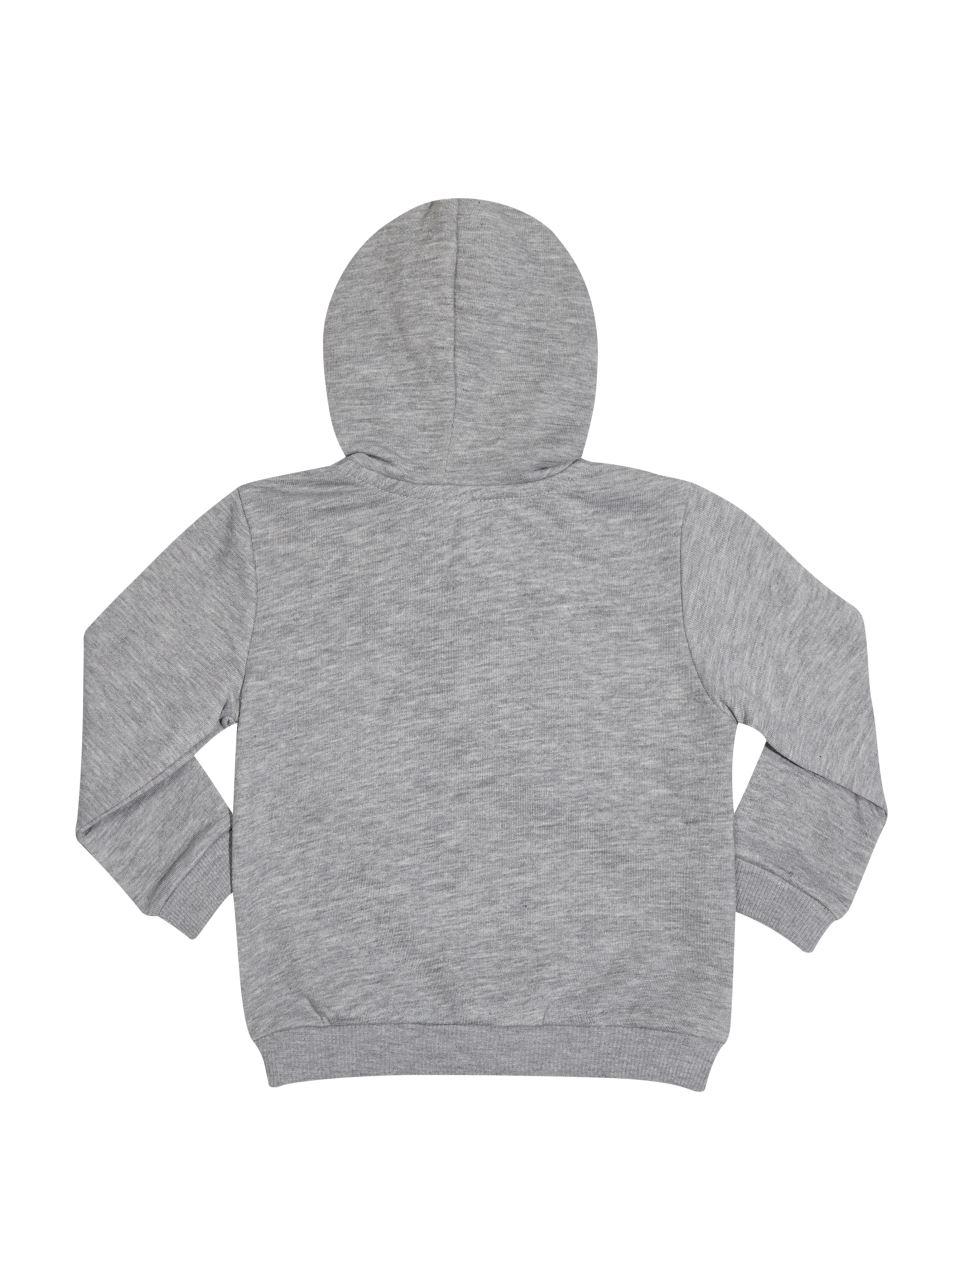 B88096 GS Logolu Sweatshirt